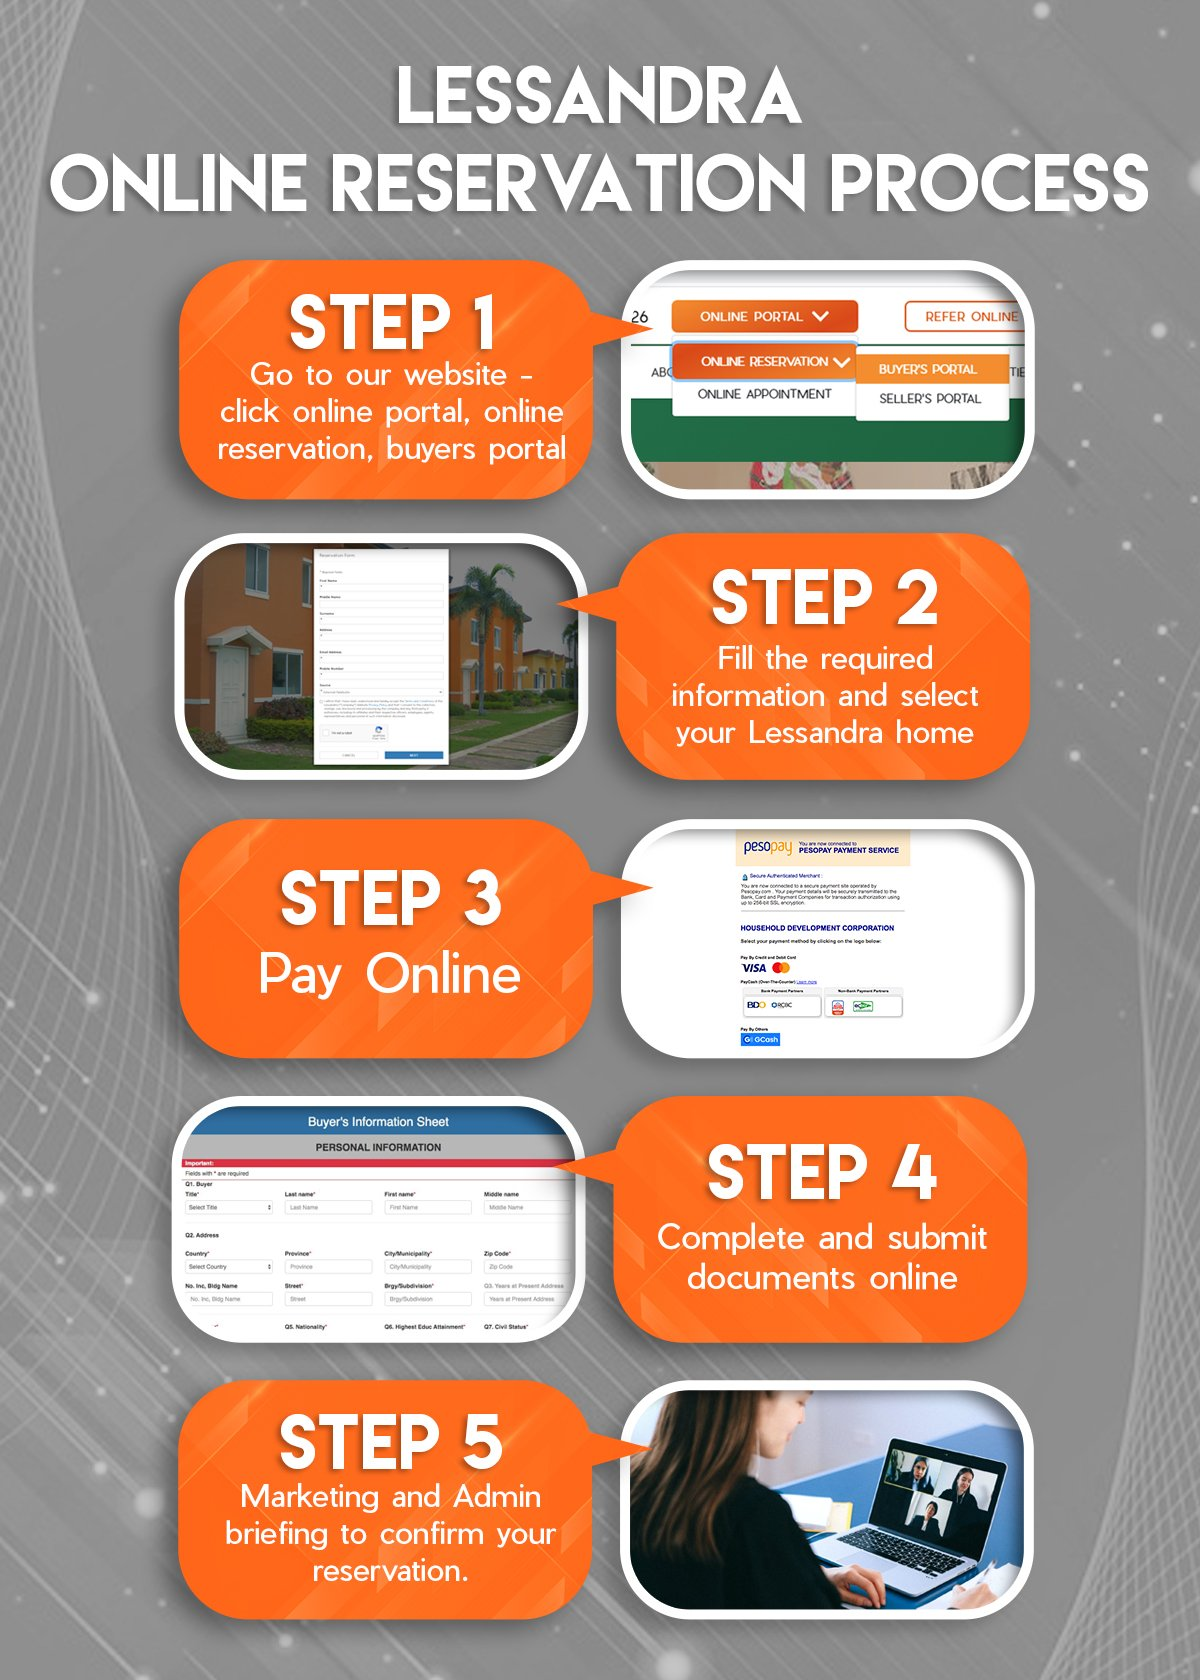 Lessandra Online Reservation Process